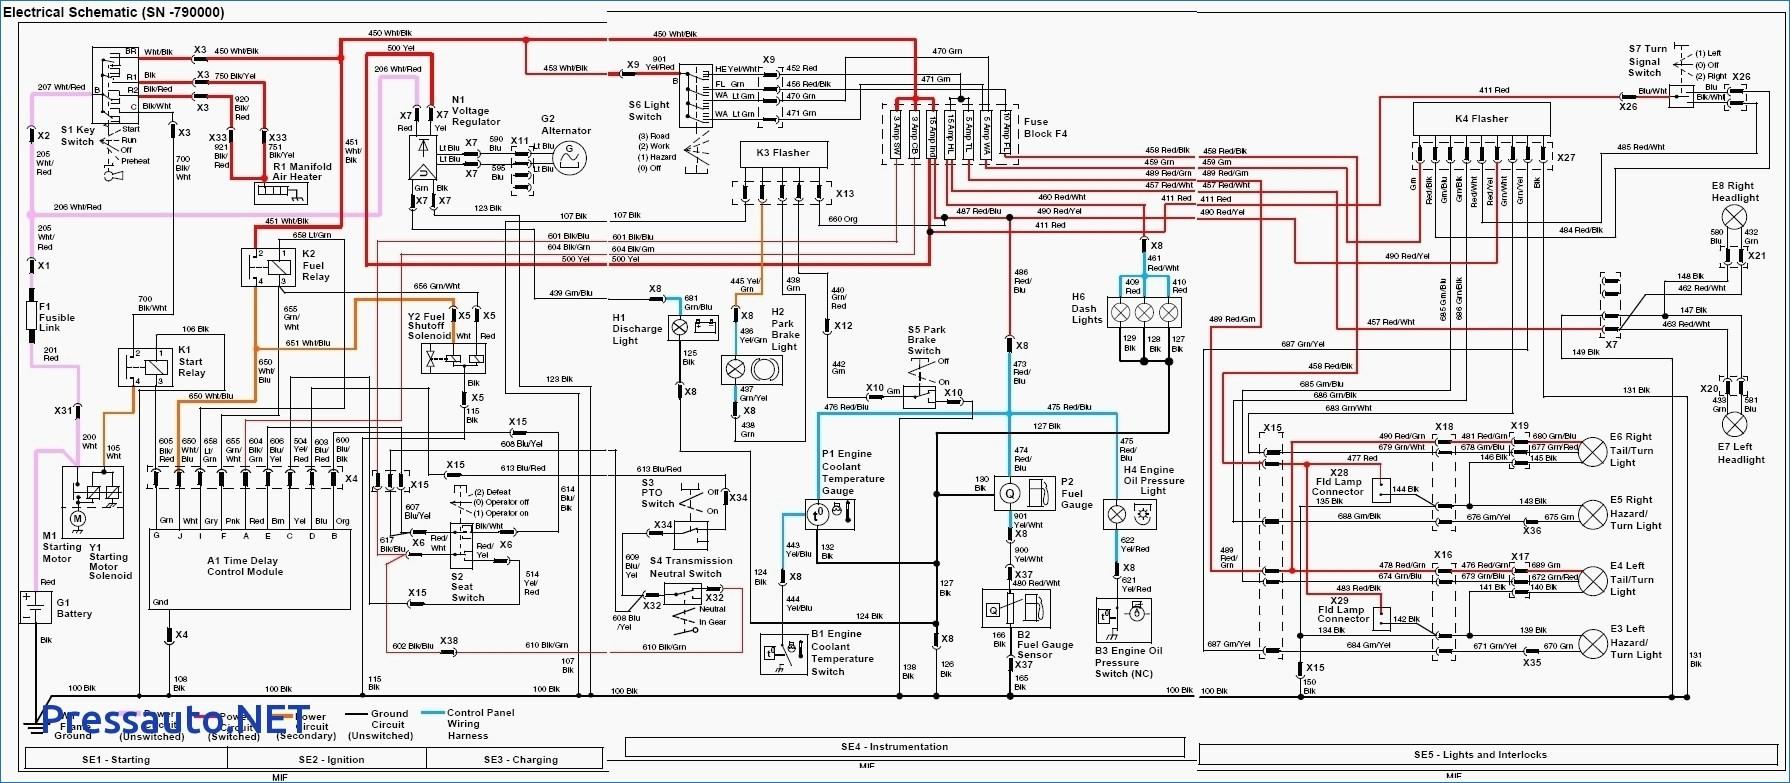 John Deere Gt235 Parts Diagram